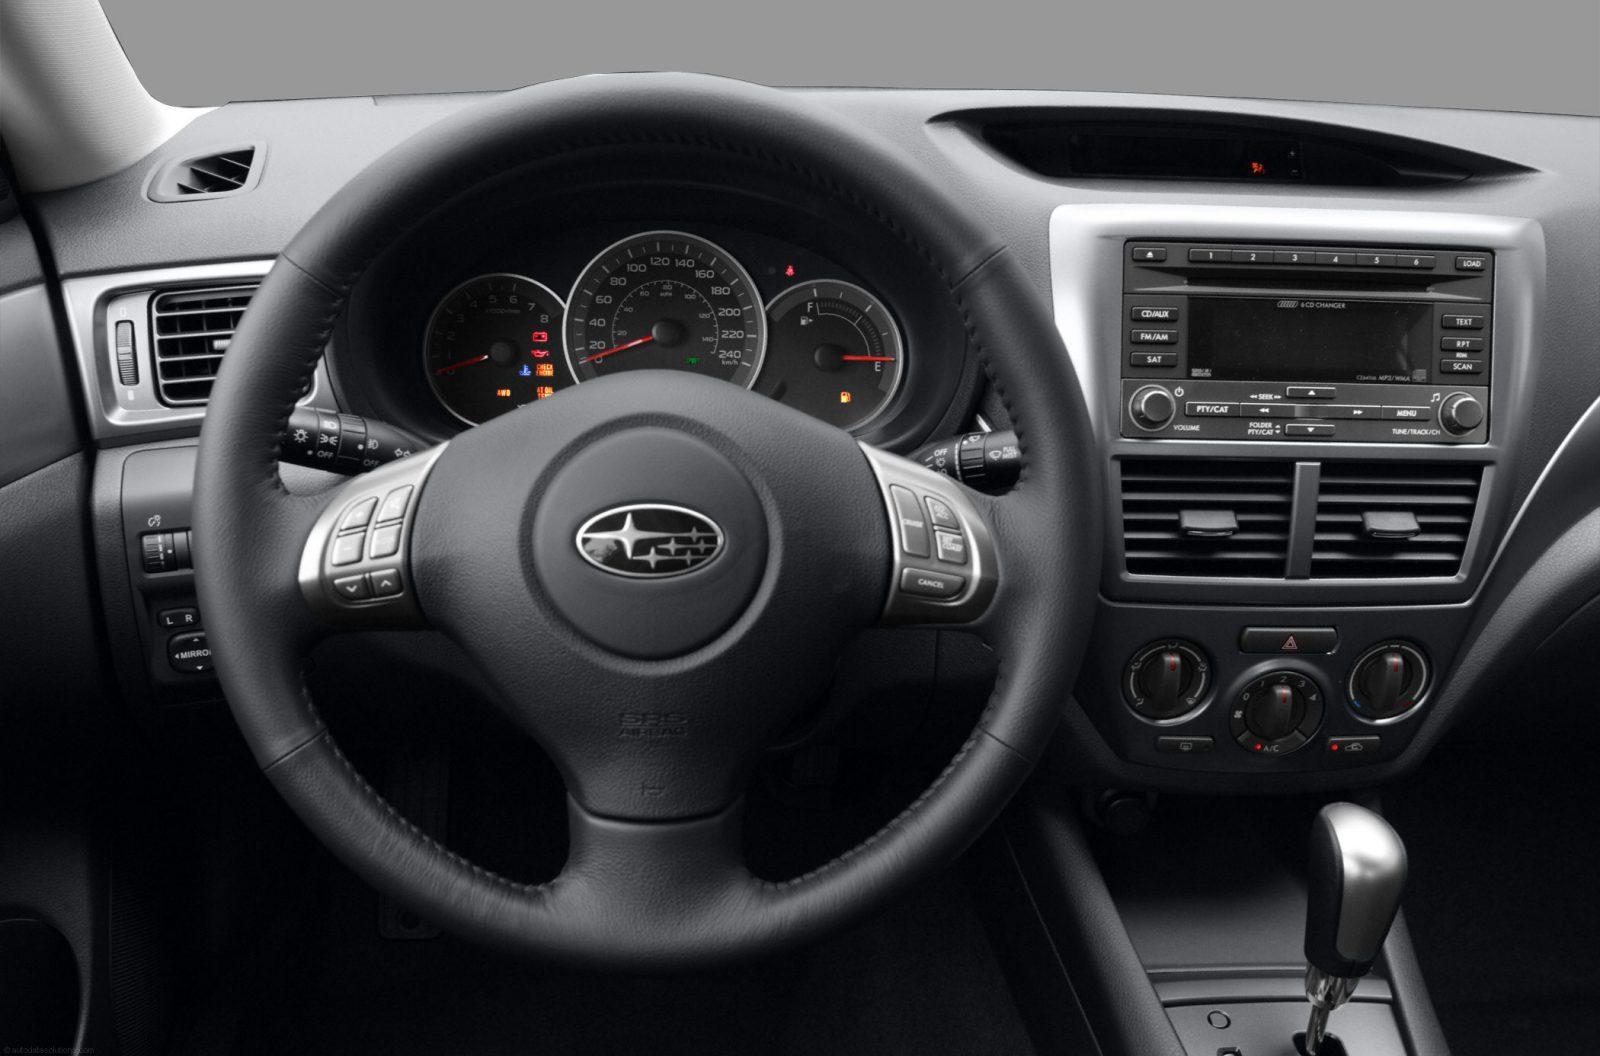 2011 subaru impreza sedan 2 5 i 4dr all wheel drive sedan interior driver side car from japan. Black Bedroom Furniture Sets. Home Design Ideas